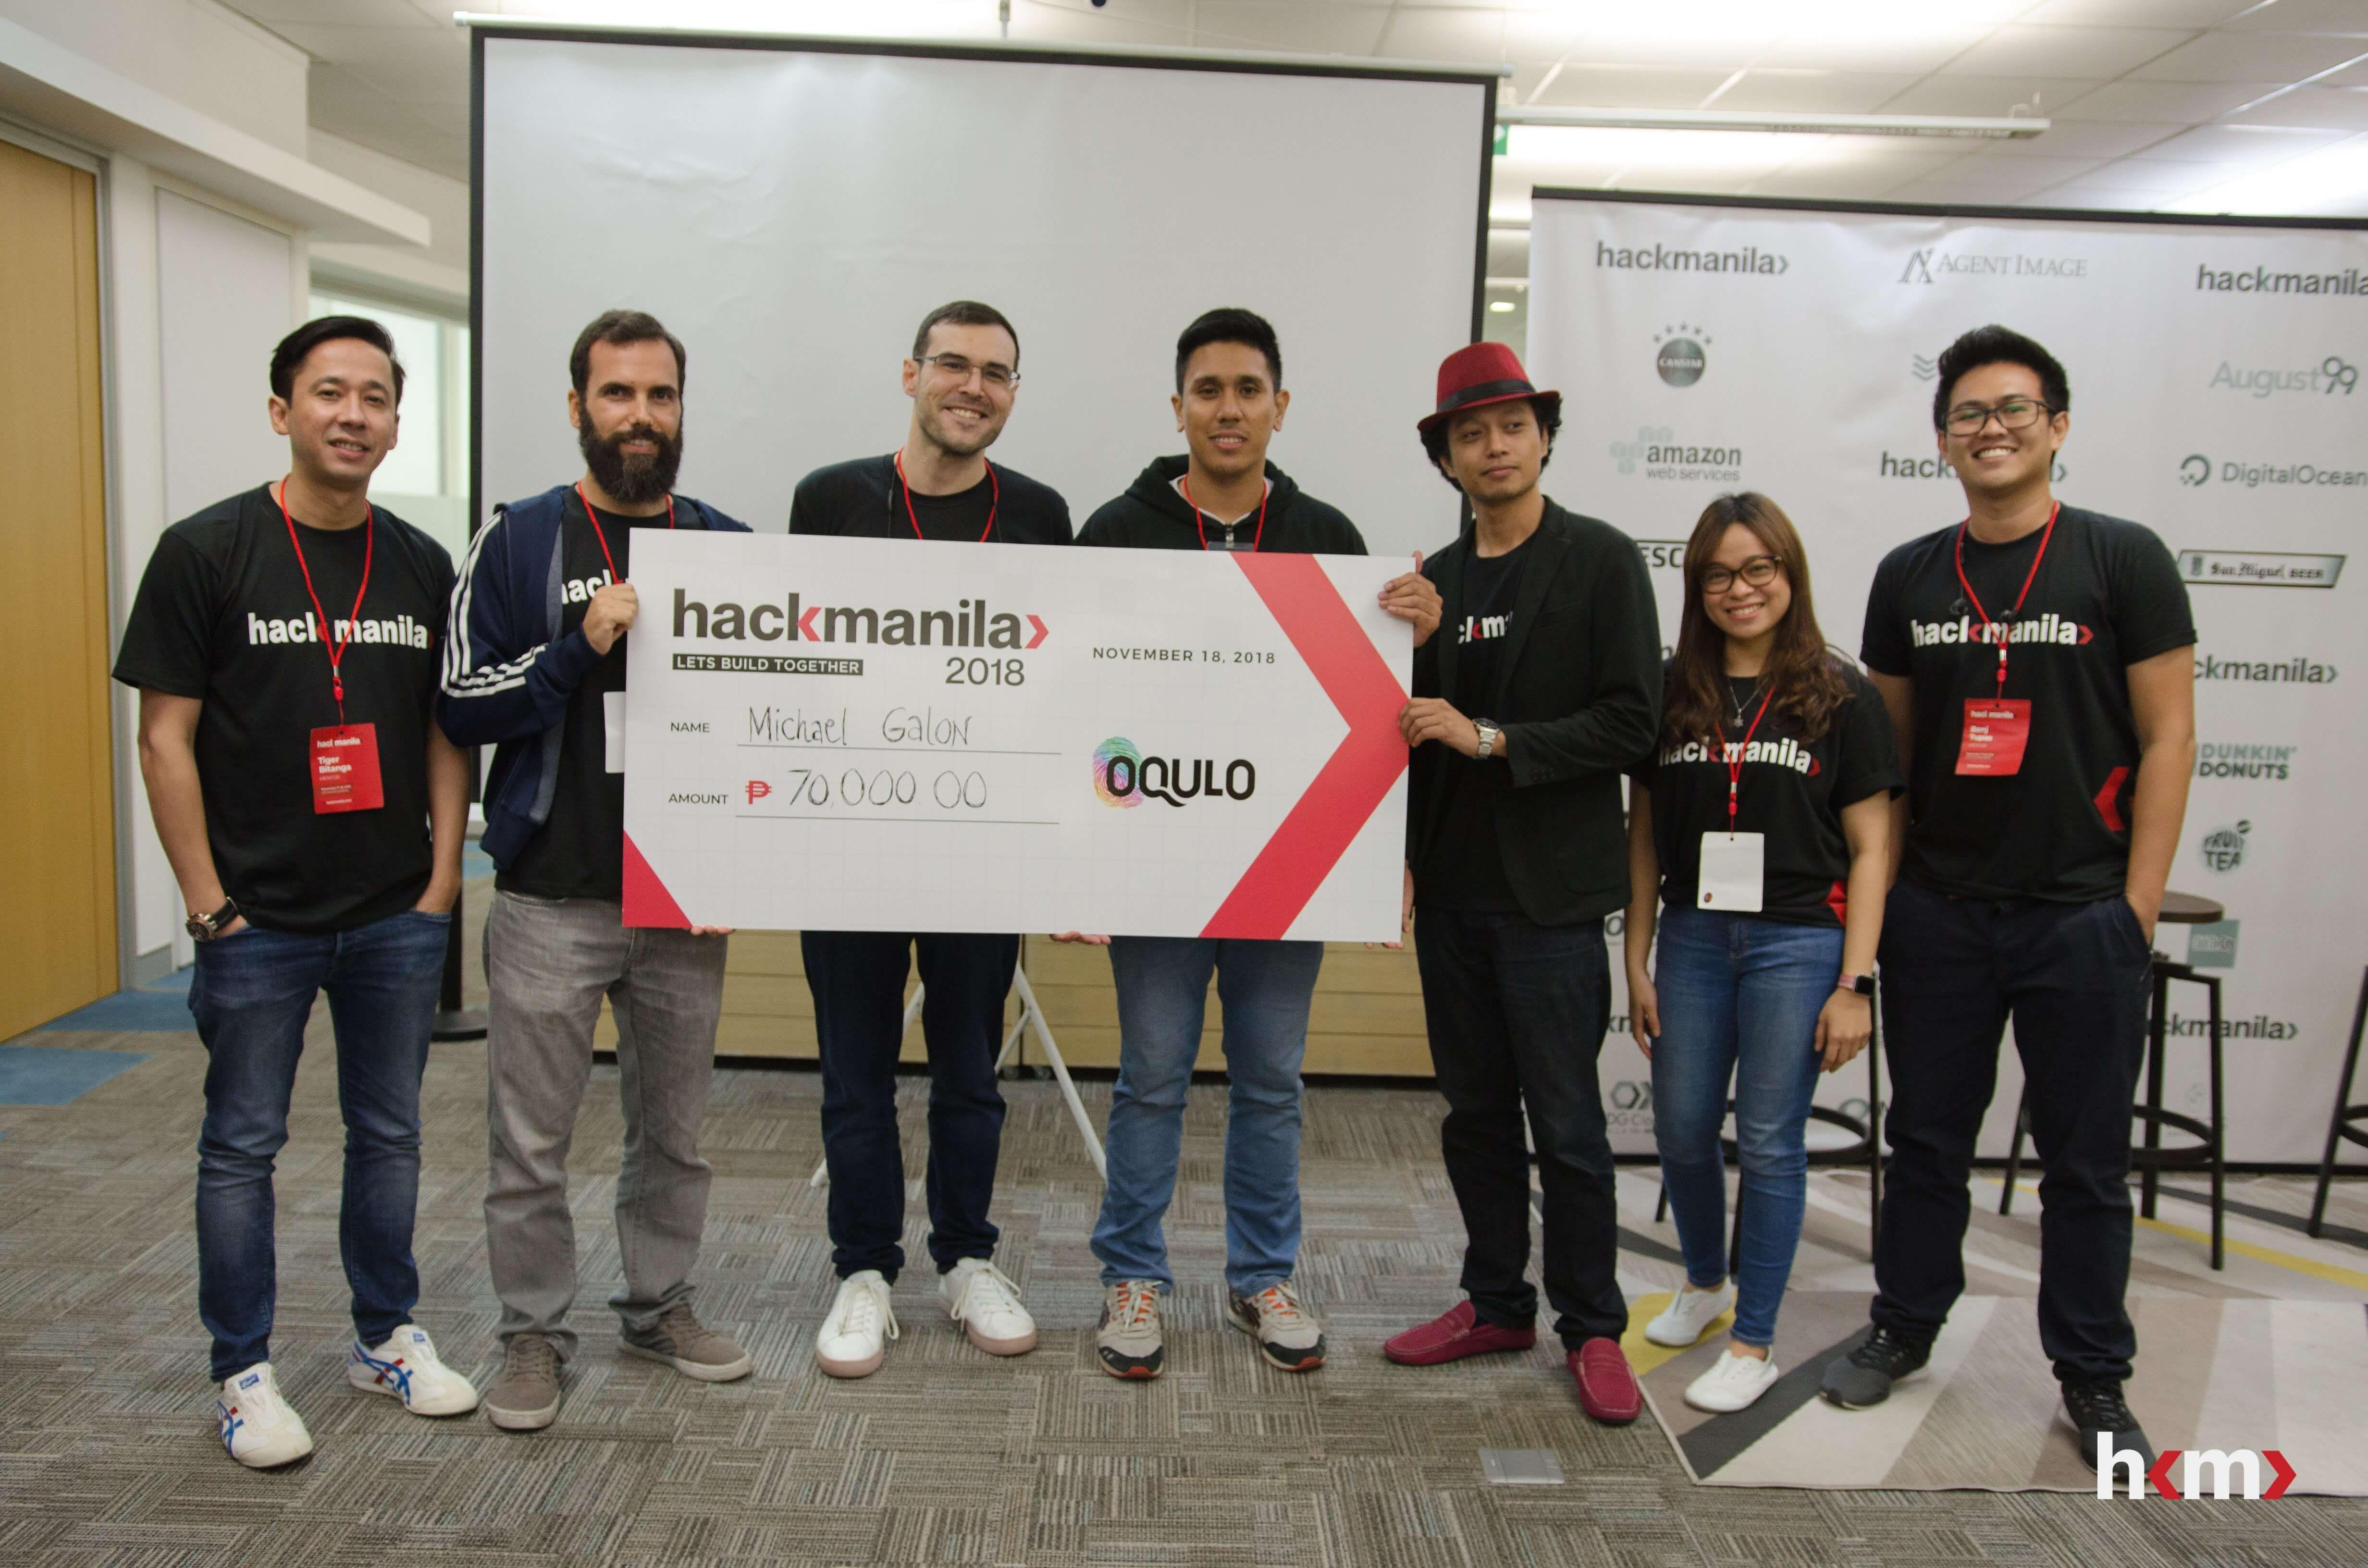 Hack Manila PartnerPortal Challenge Winner: Michael Galon with mentors